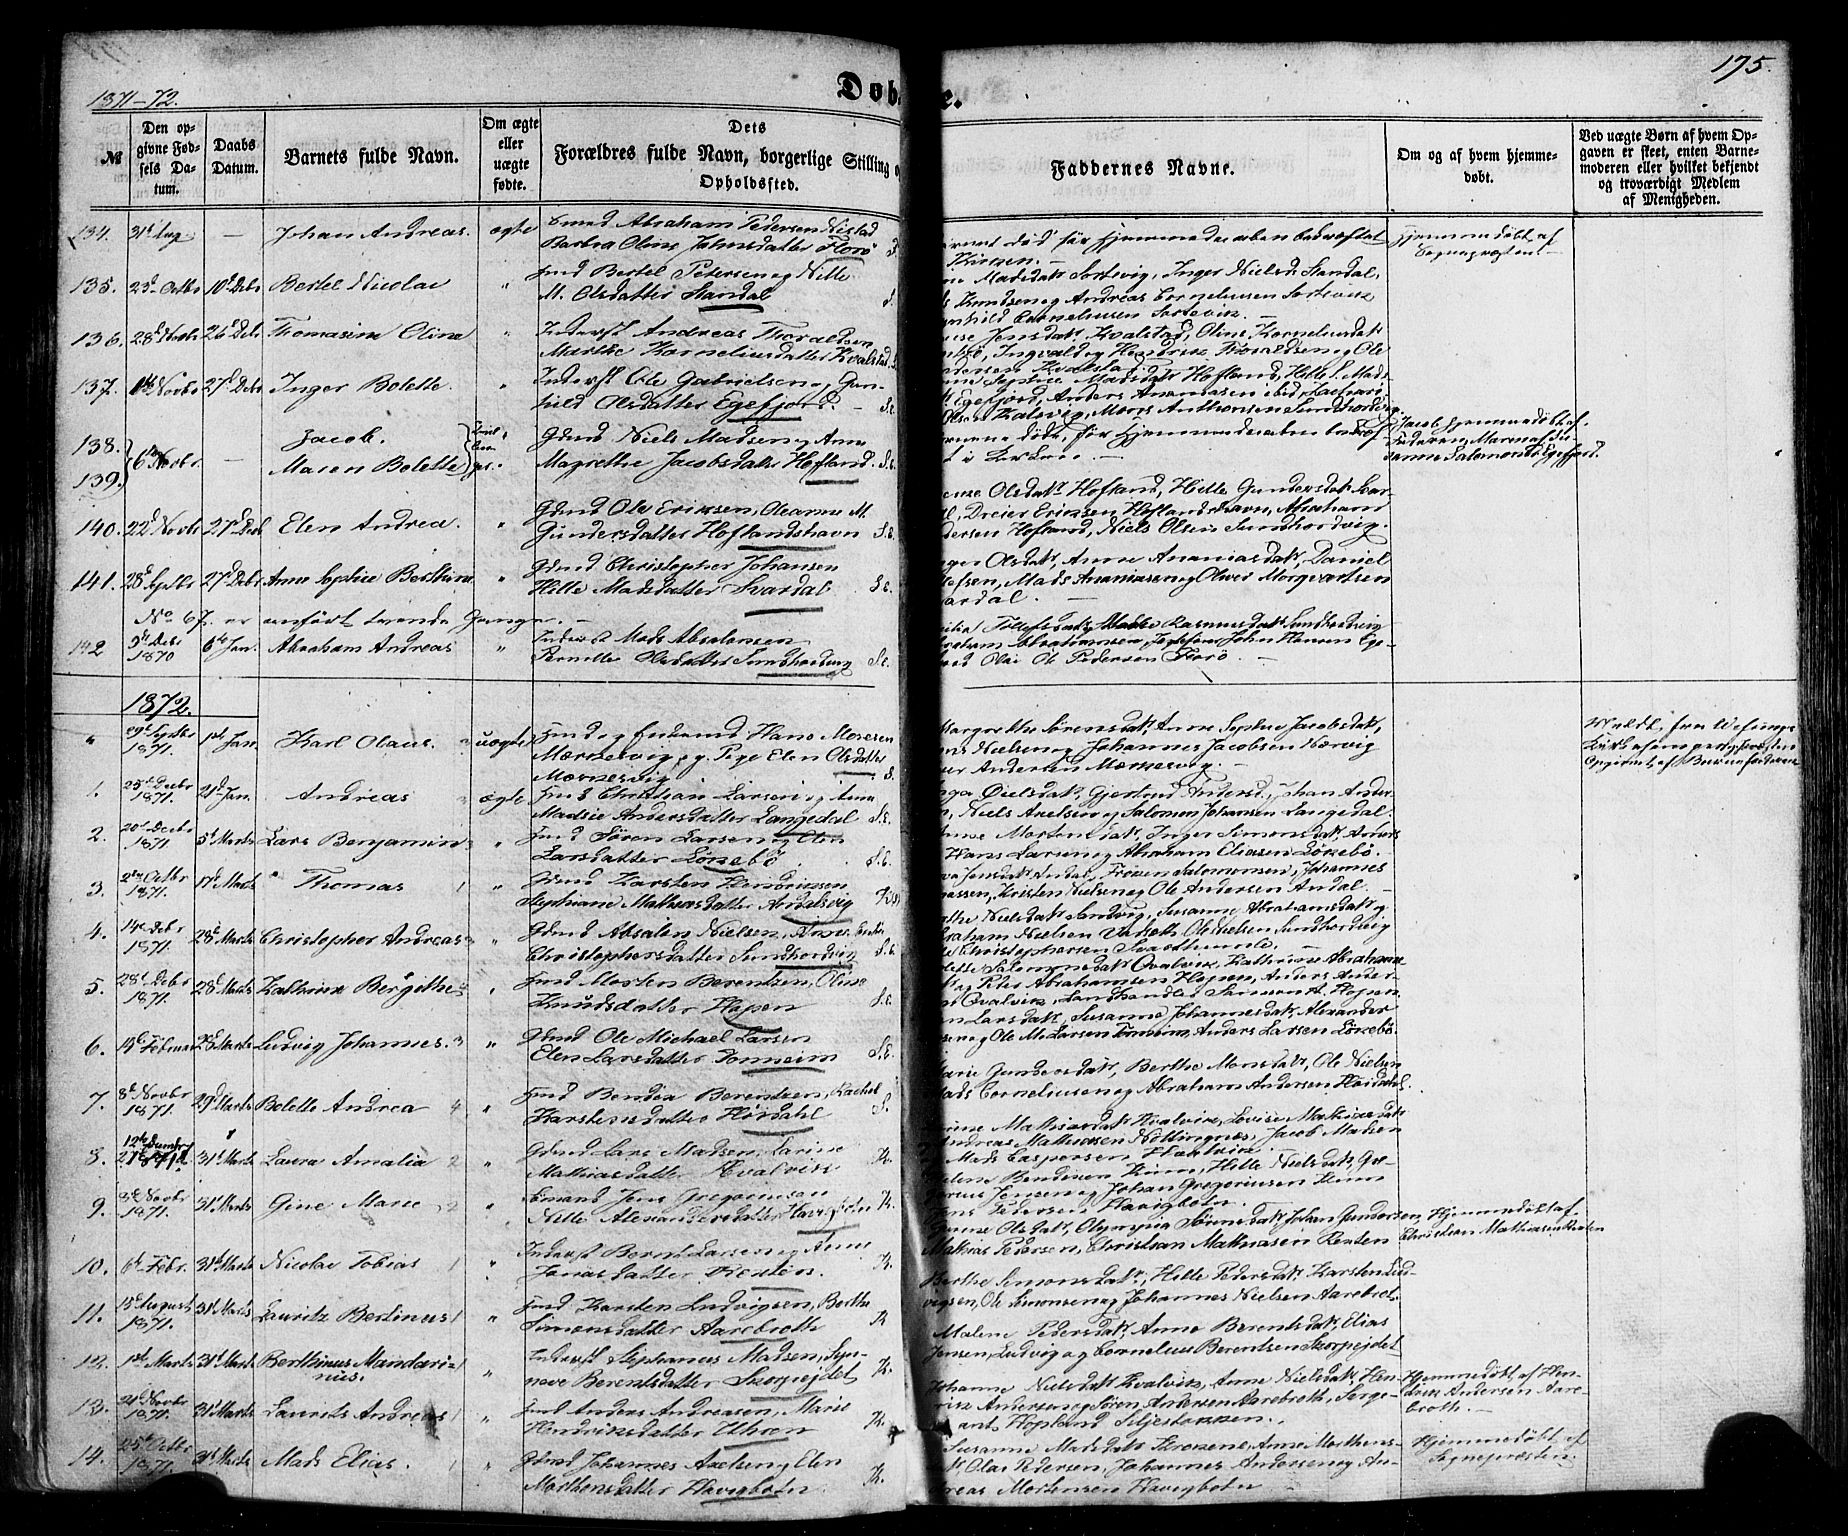 SAB, Kinn sokneprestembete, H/Haa/Haaa/L0006: Ministerialbok nr. A 6, 1857-1885, s. 175